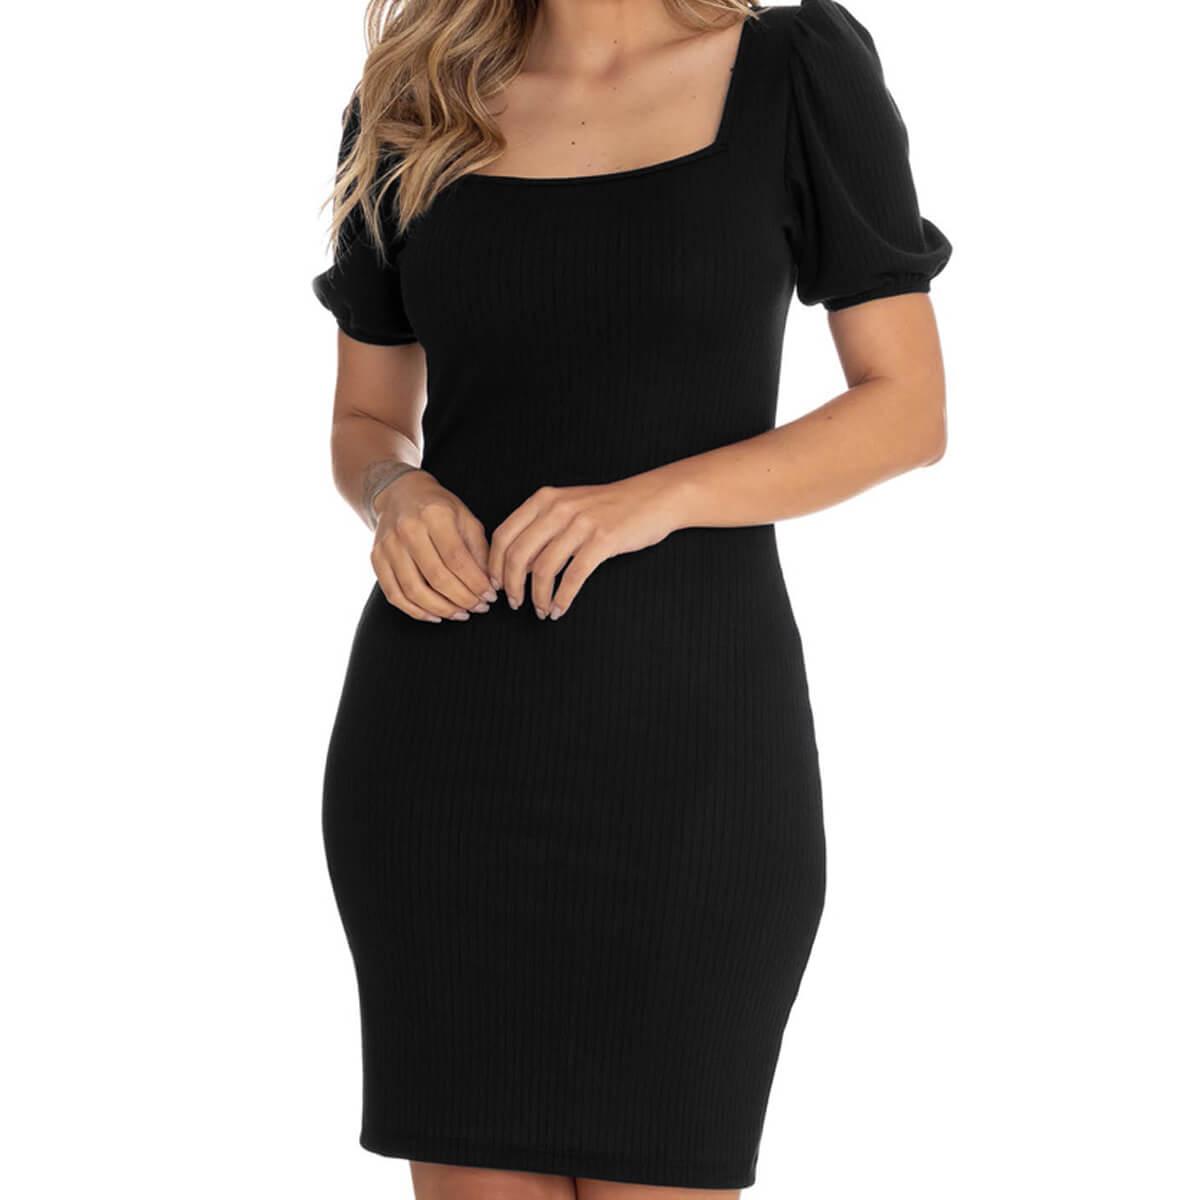 Vestido Feminino Curto Cetim Canelado Preto